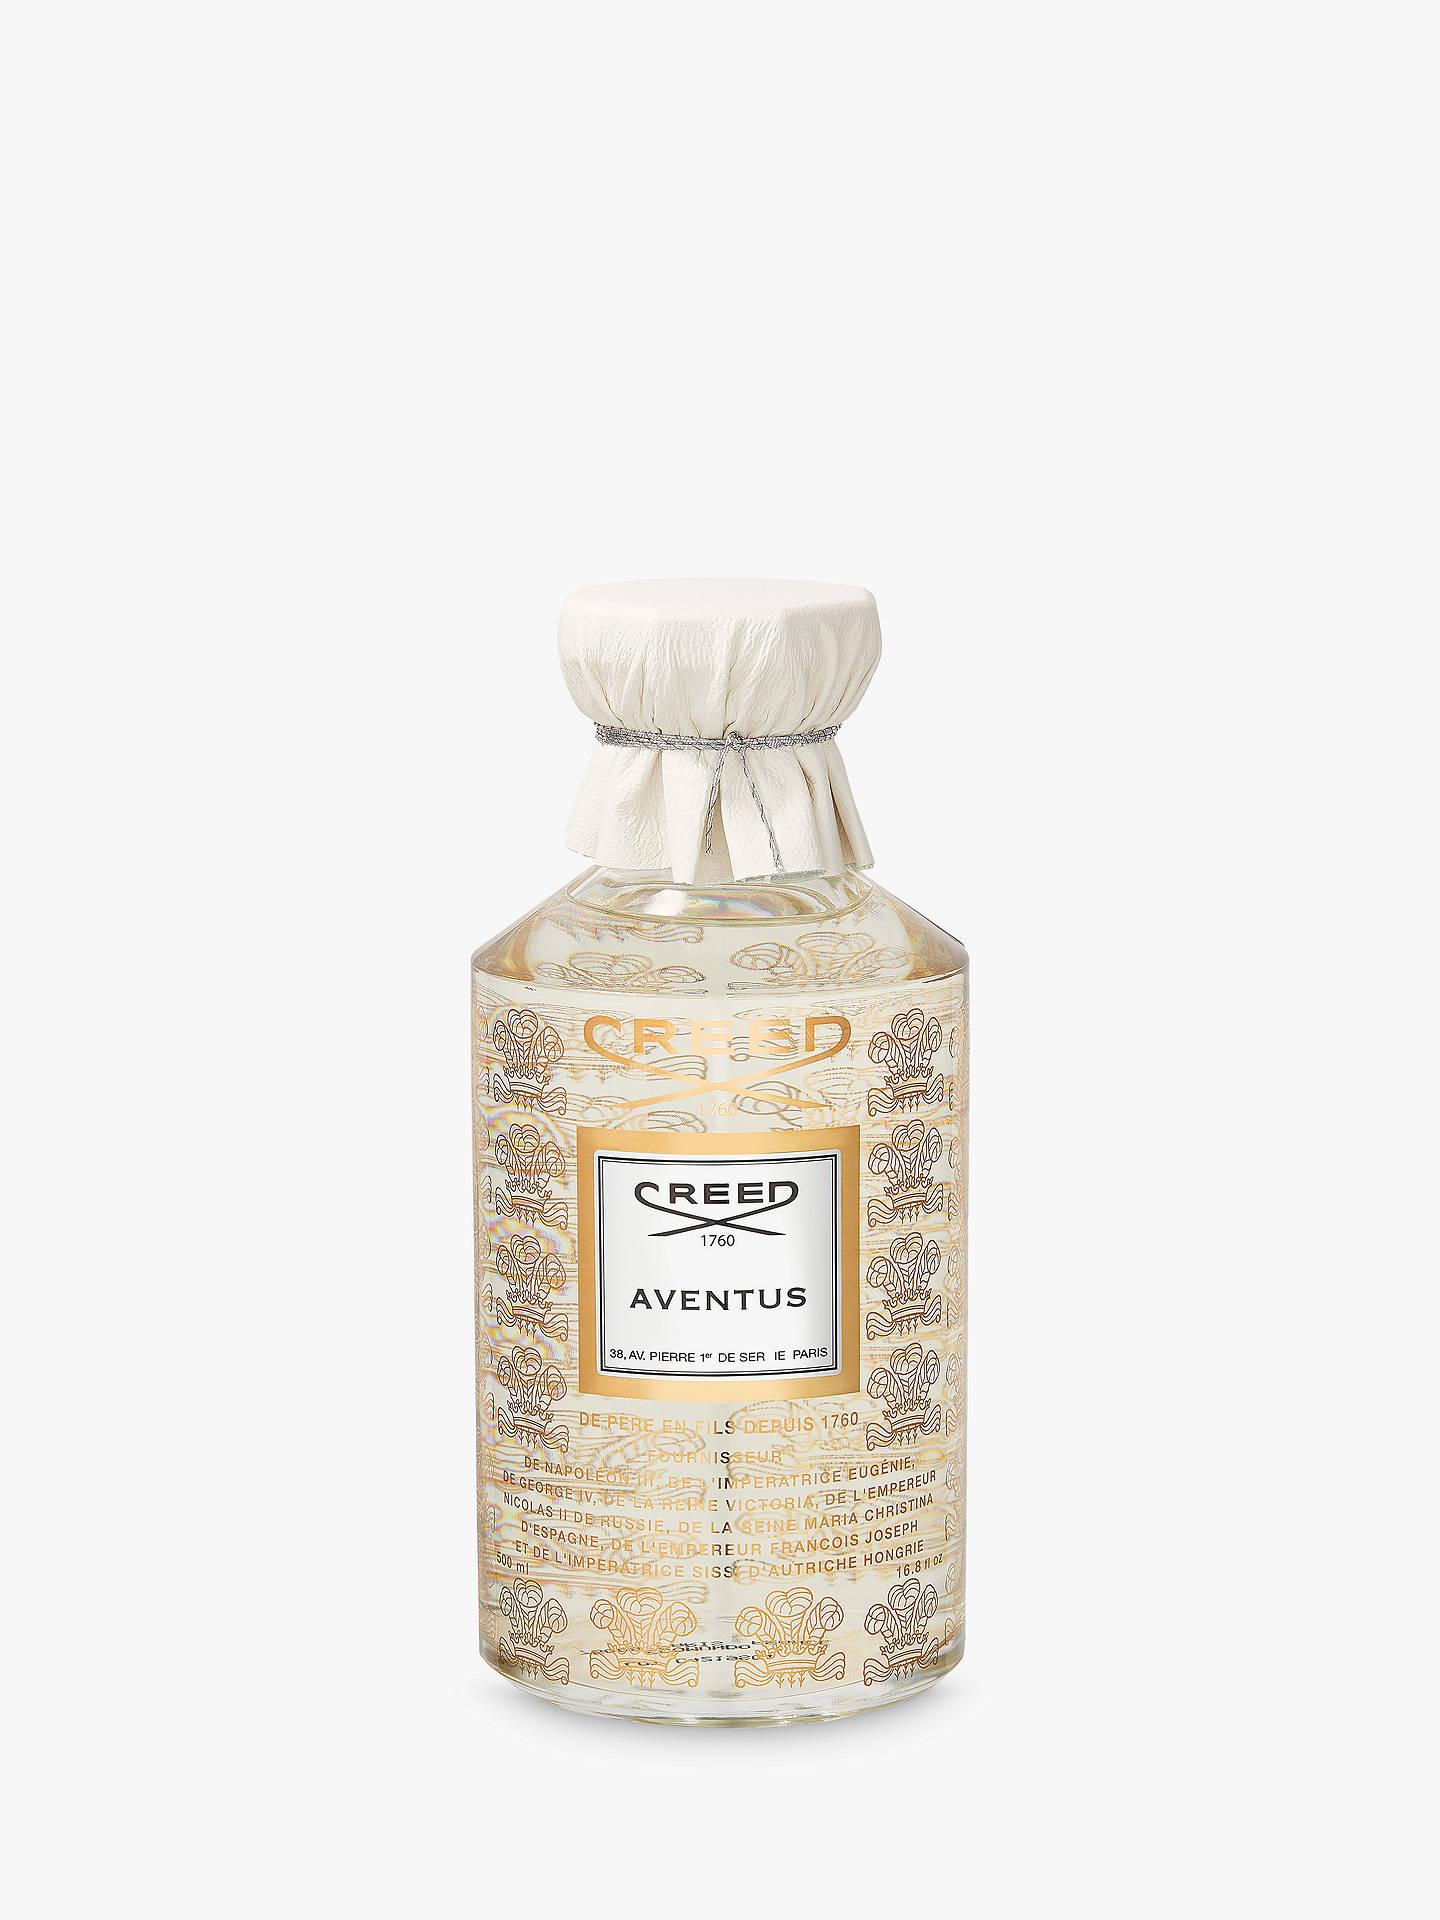 Creed Aventus Splash Eau De Parfum 500ml At John Lewis Partners